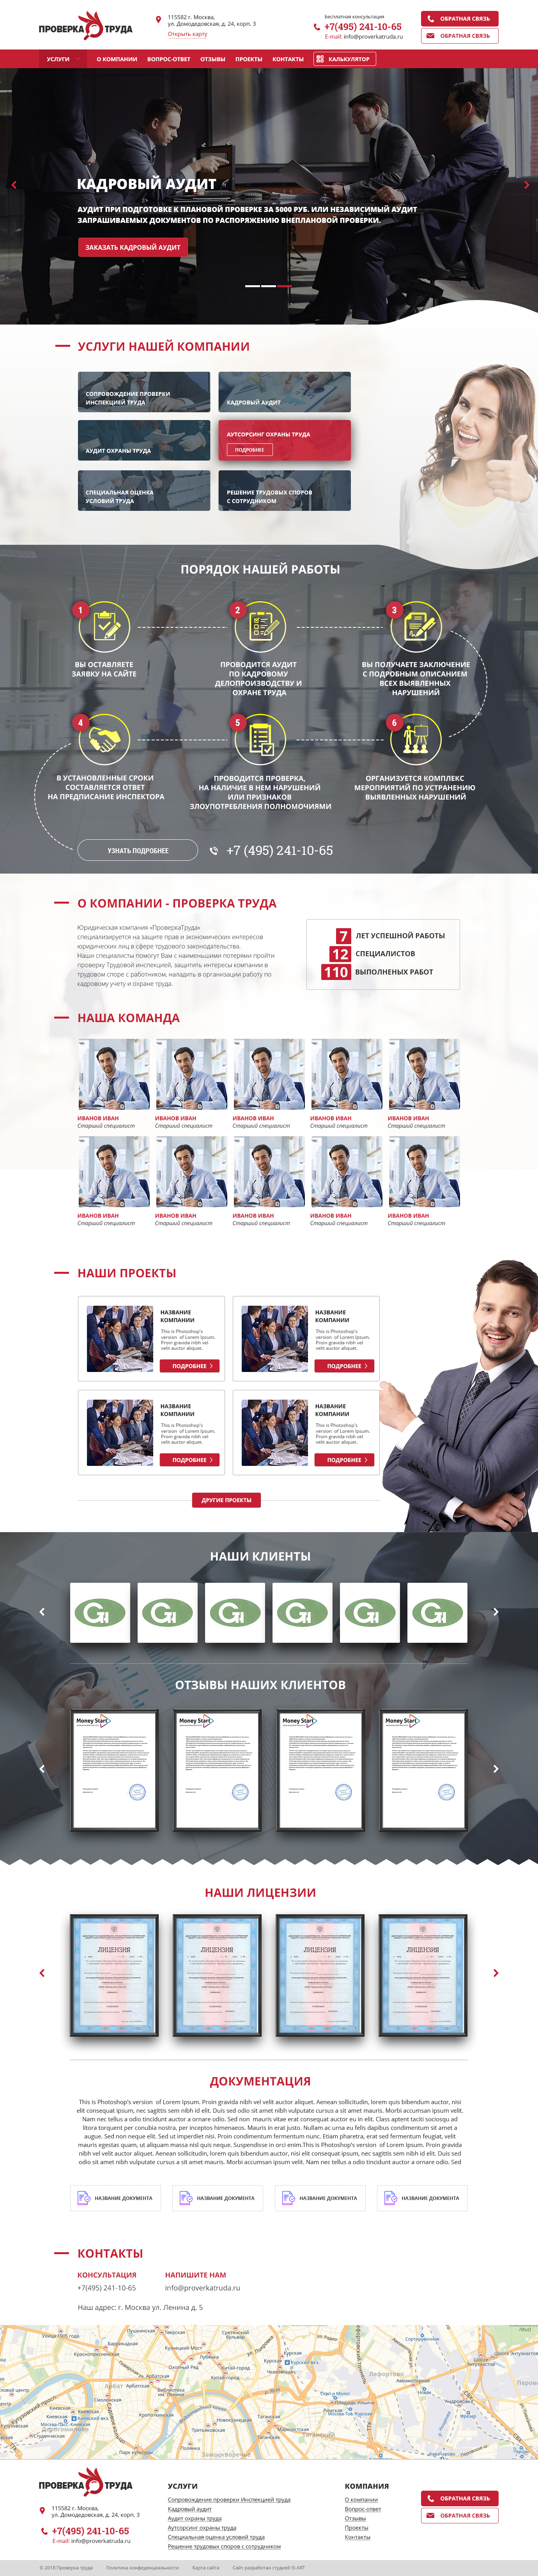 Макет сайта Проверка труда 1